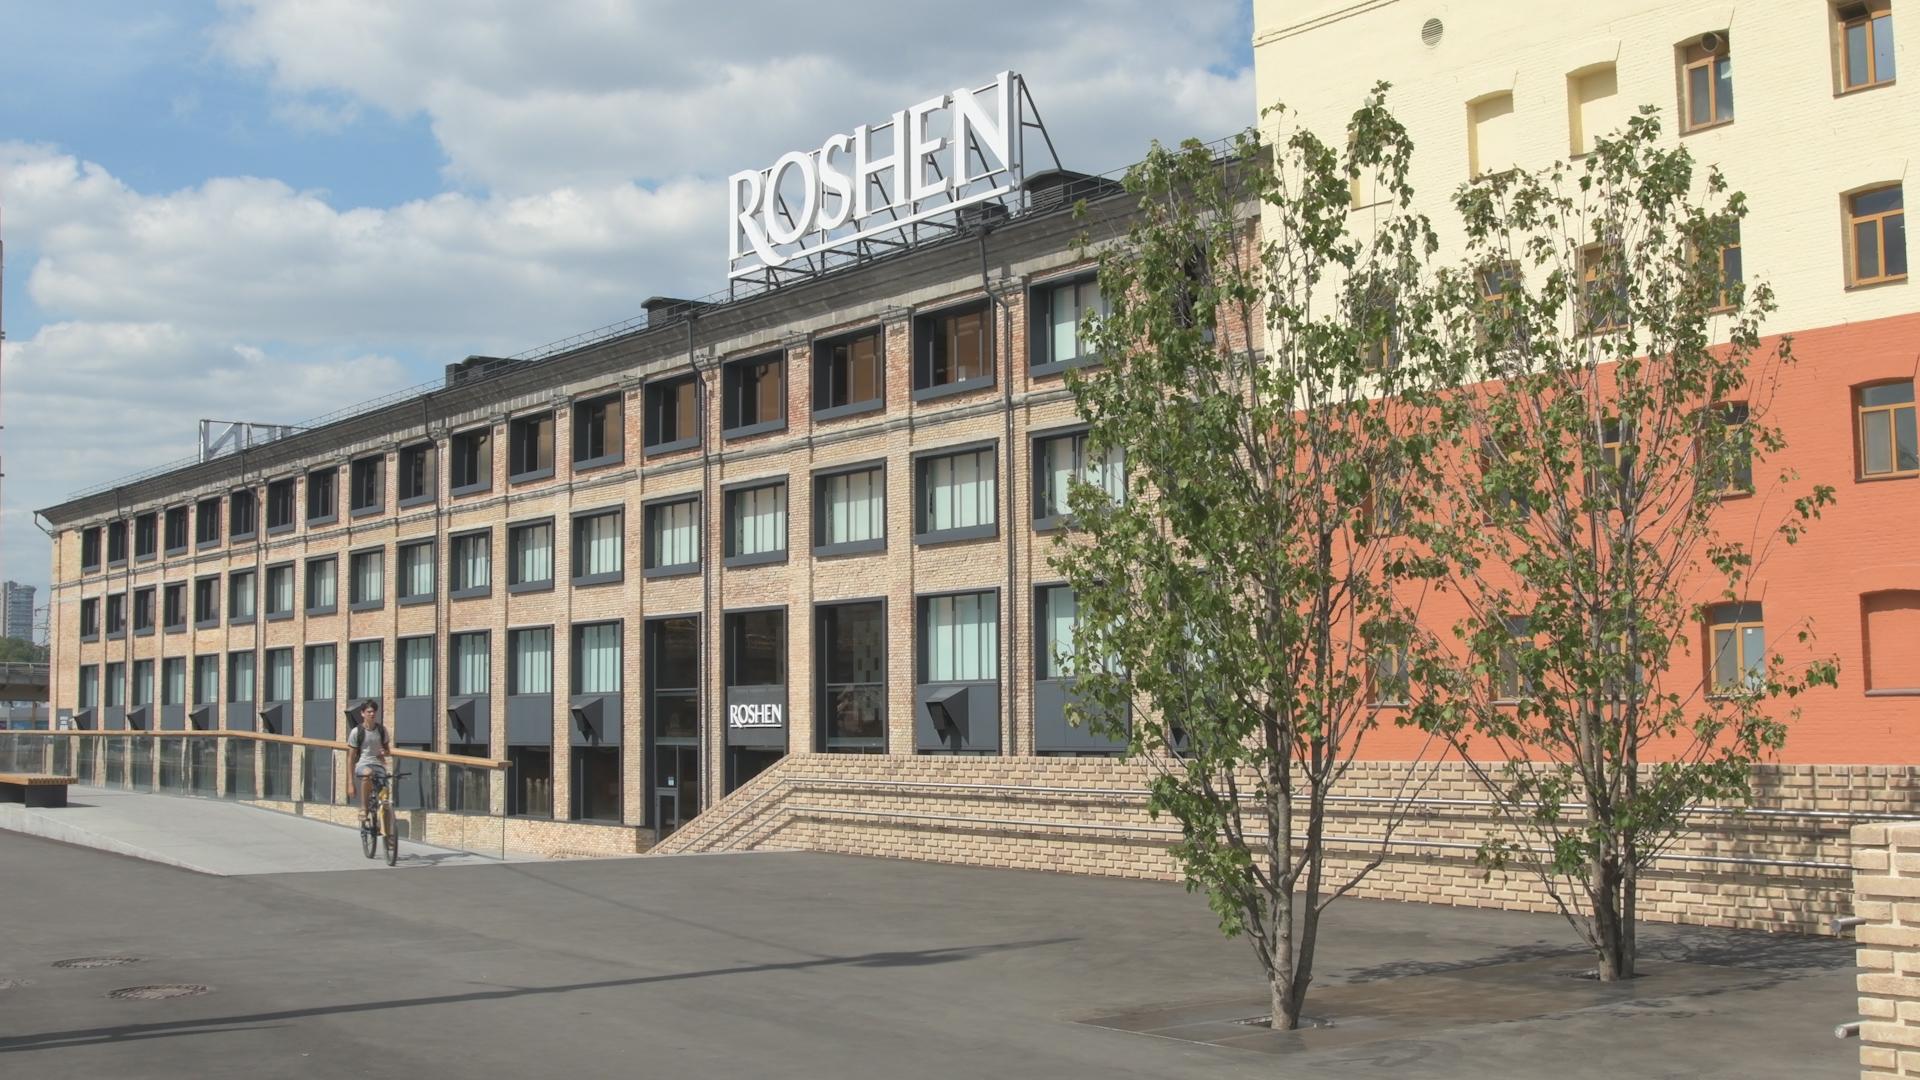 Pedestrian area near Roshen factory